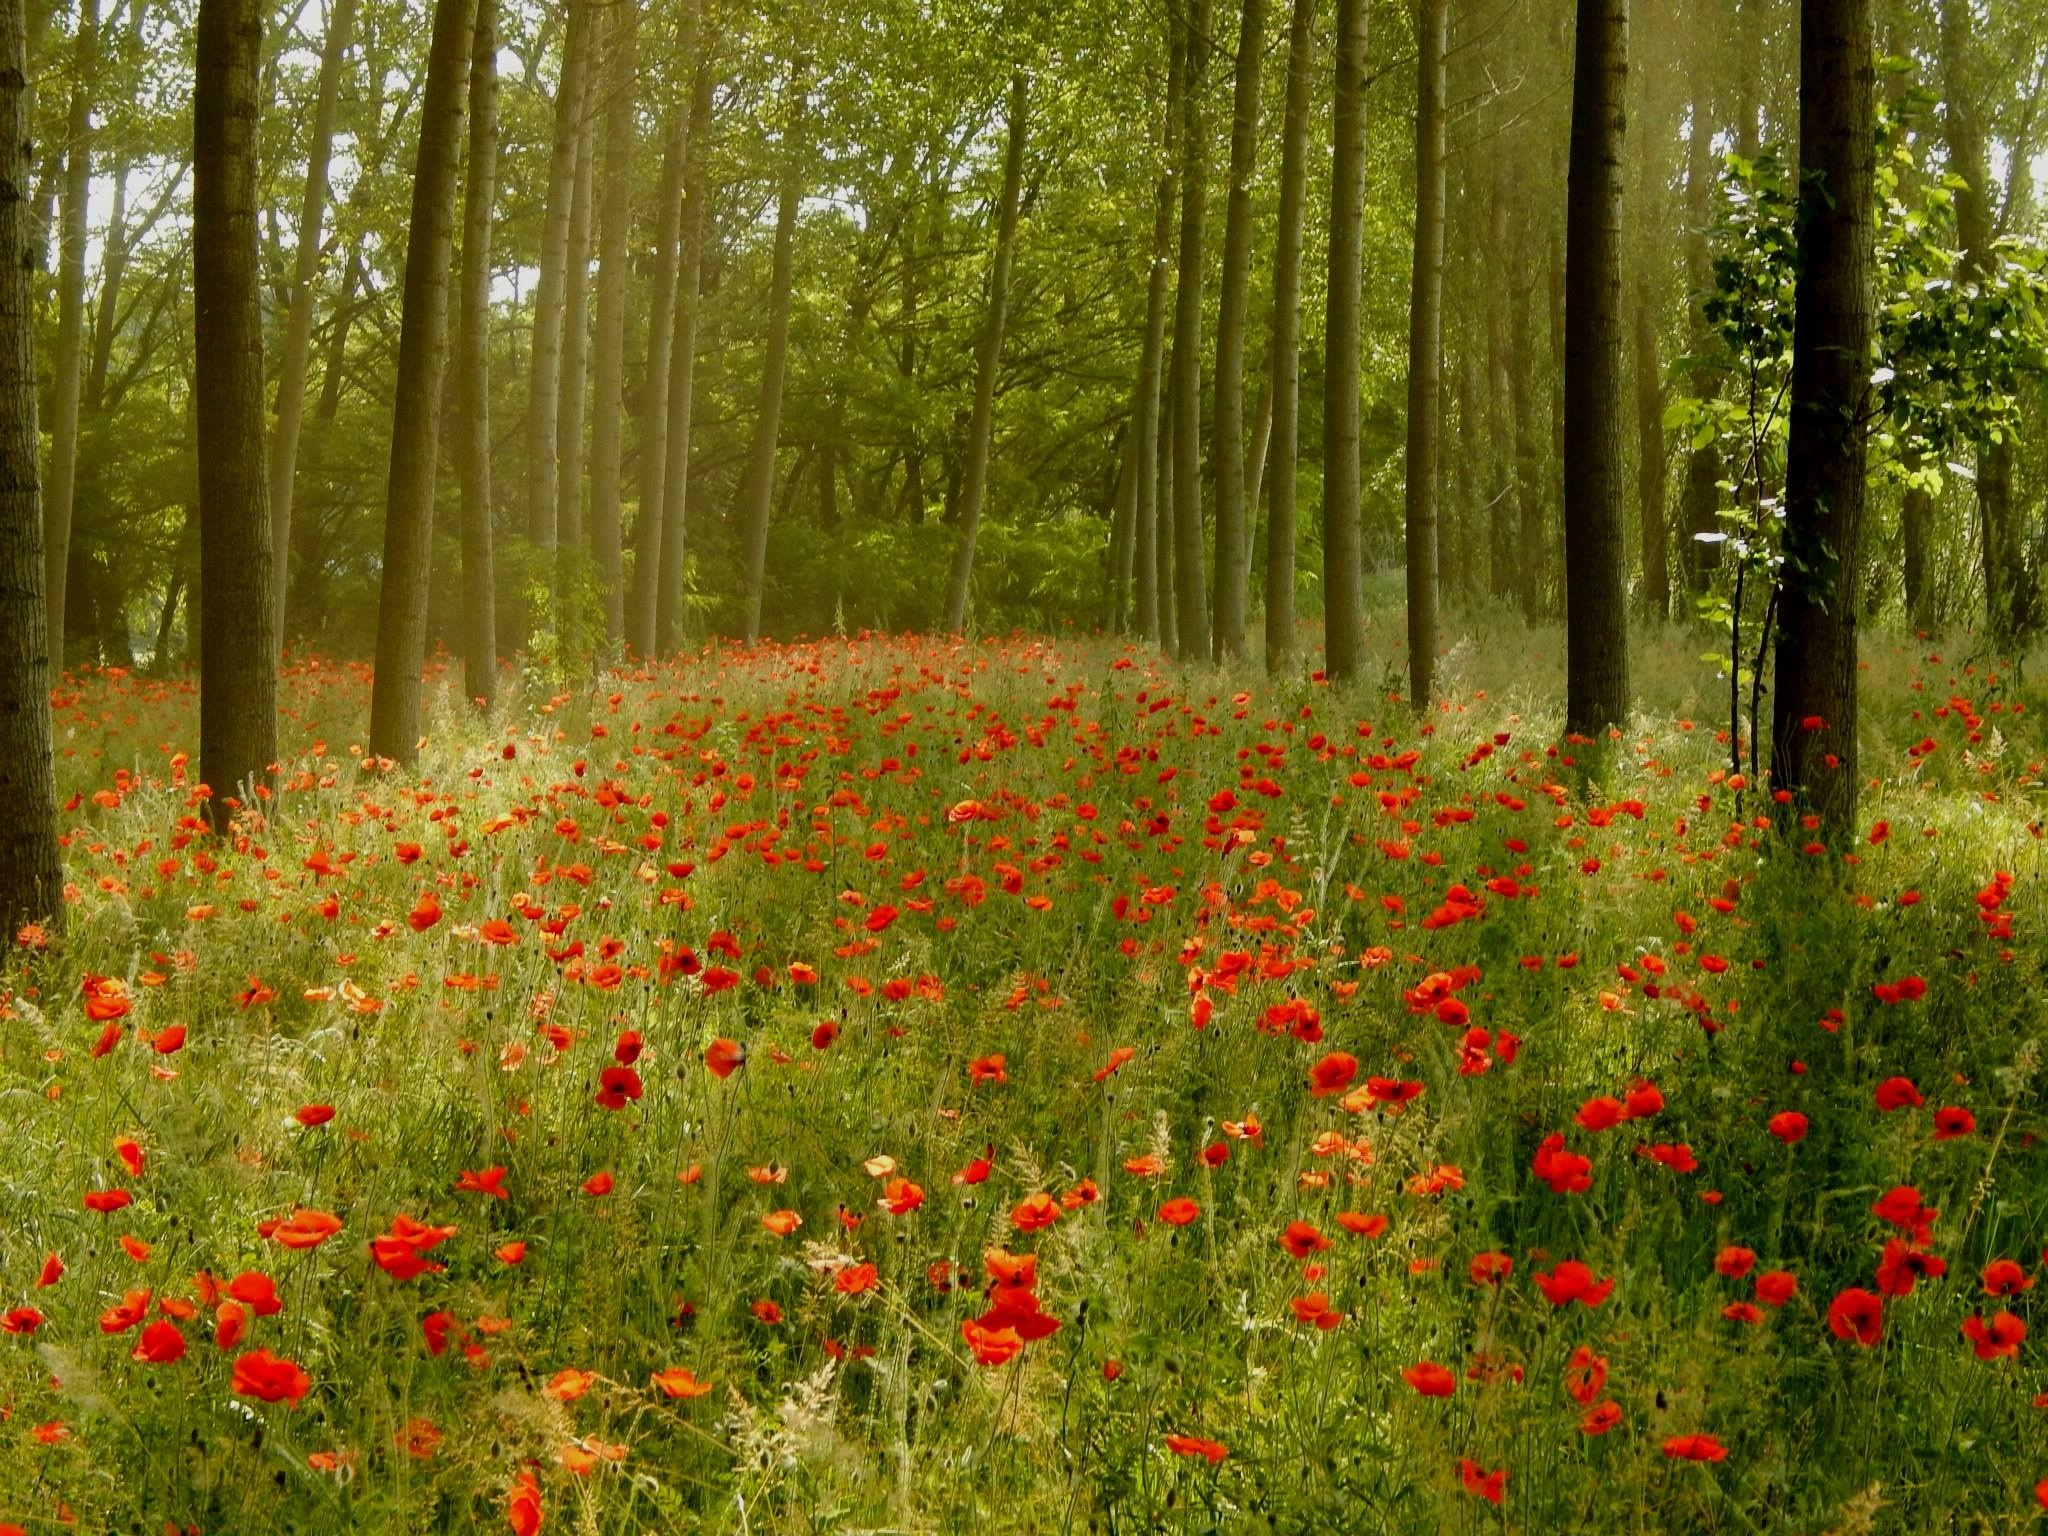 Enchanted Wood  by robertamastretta